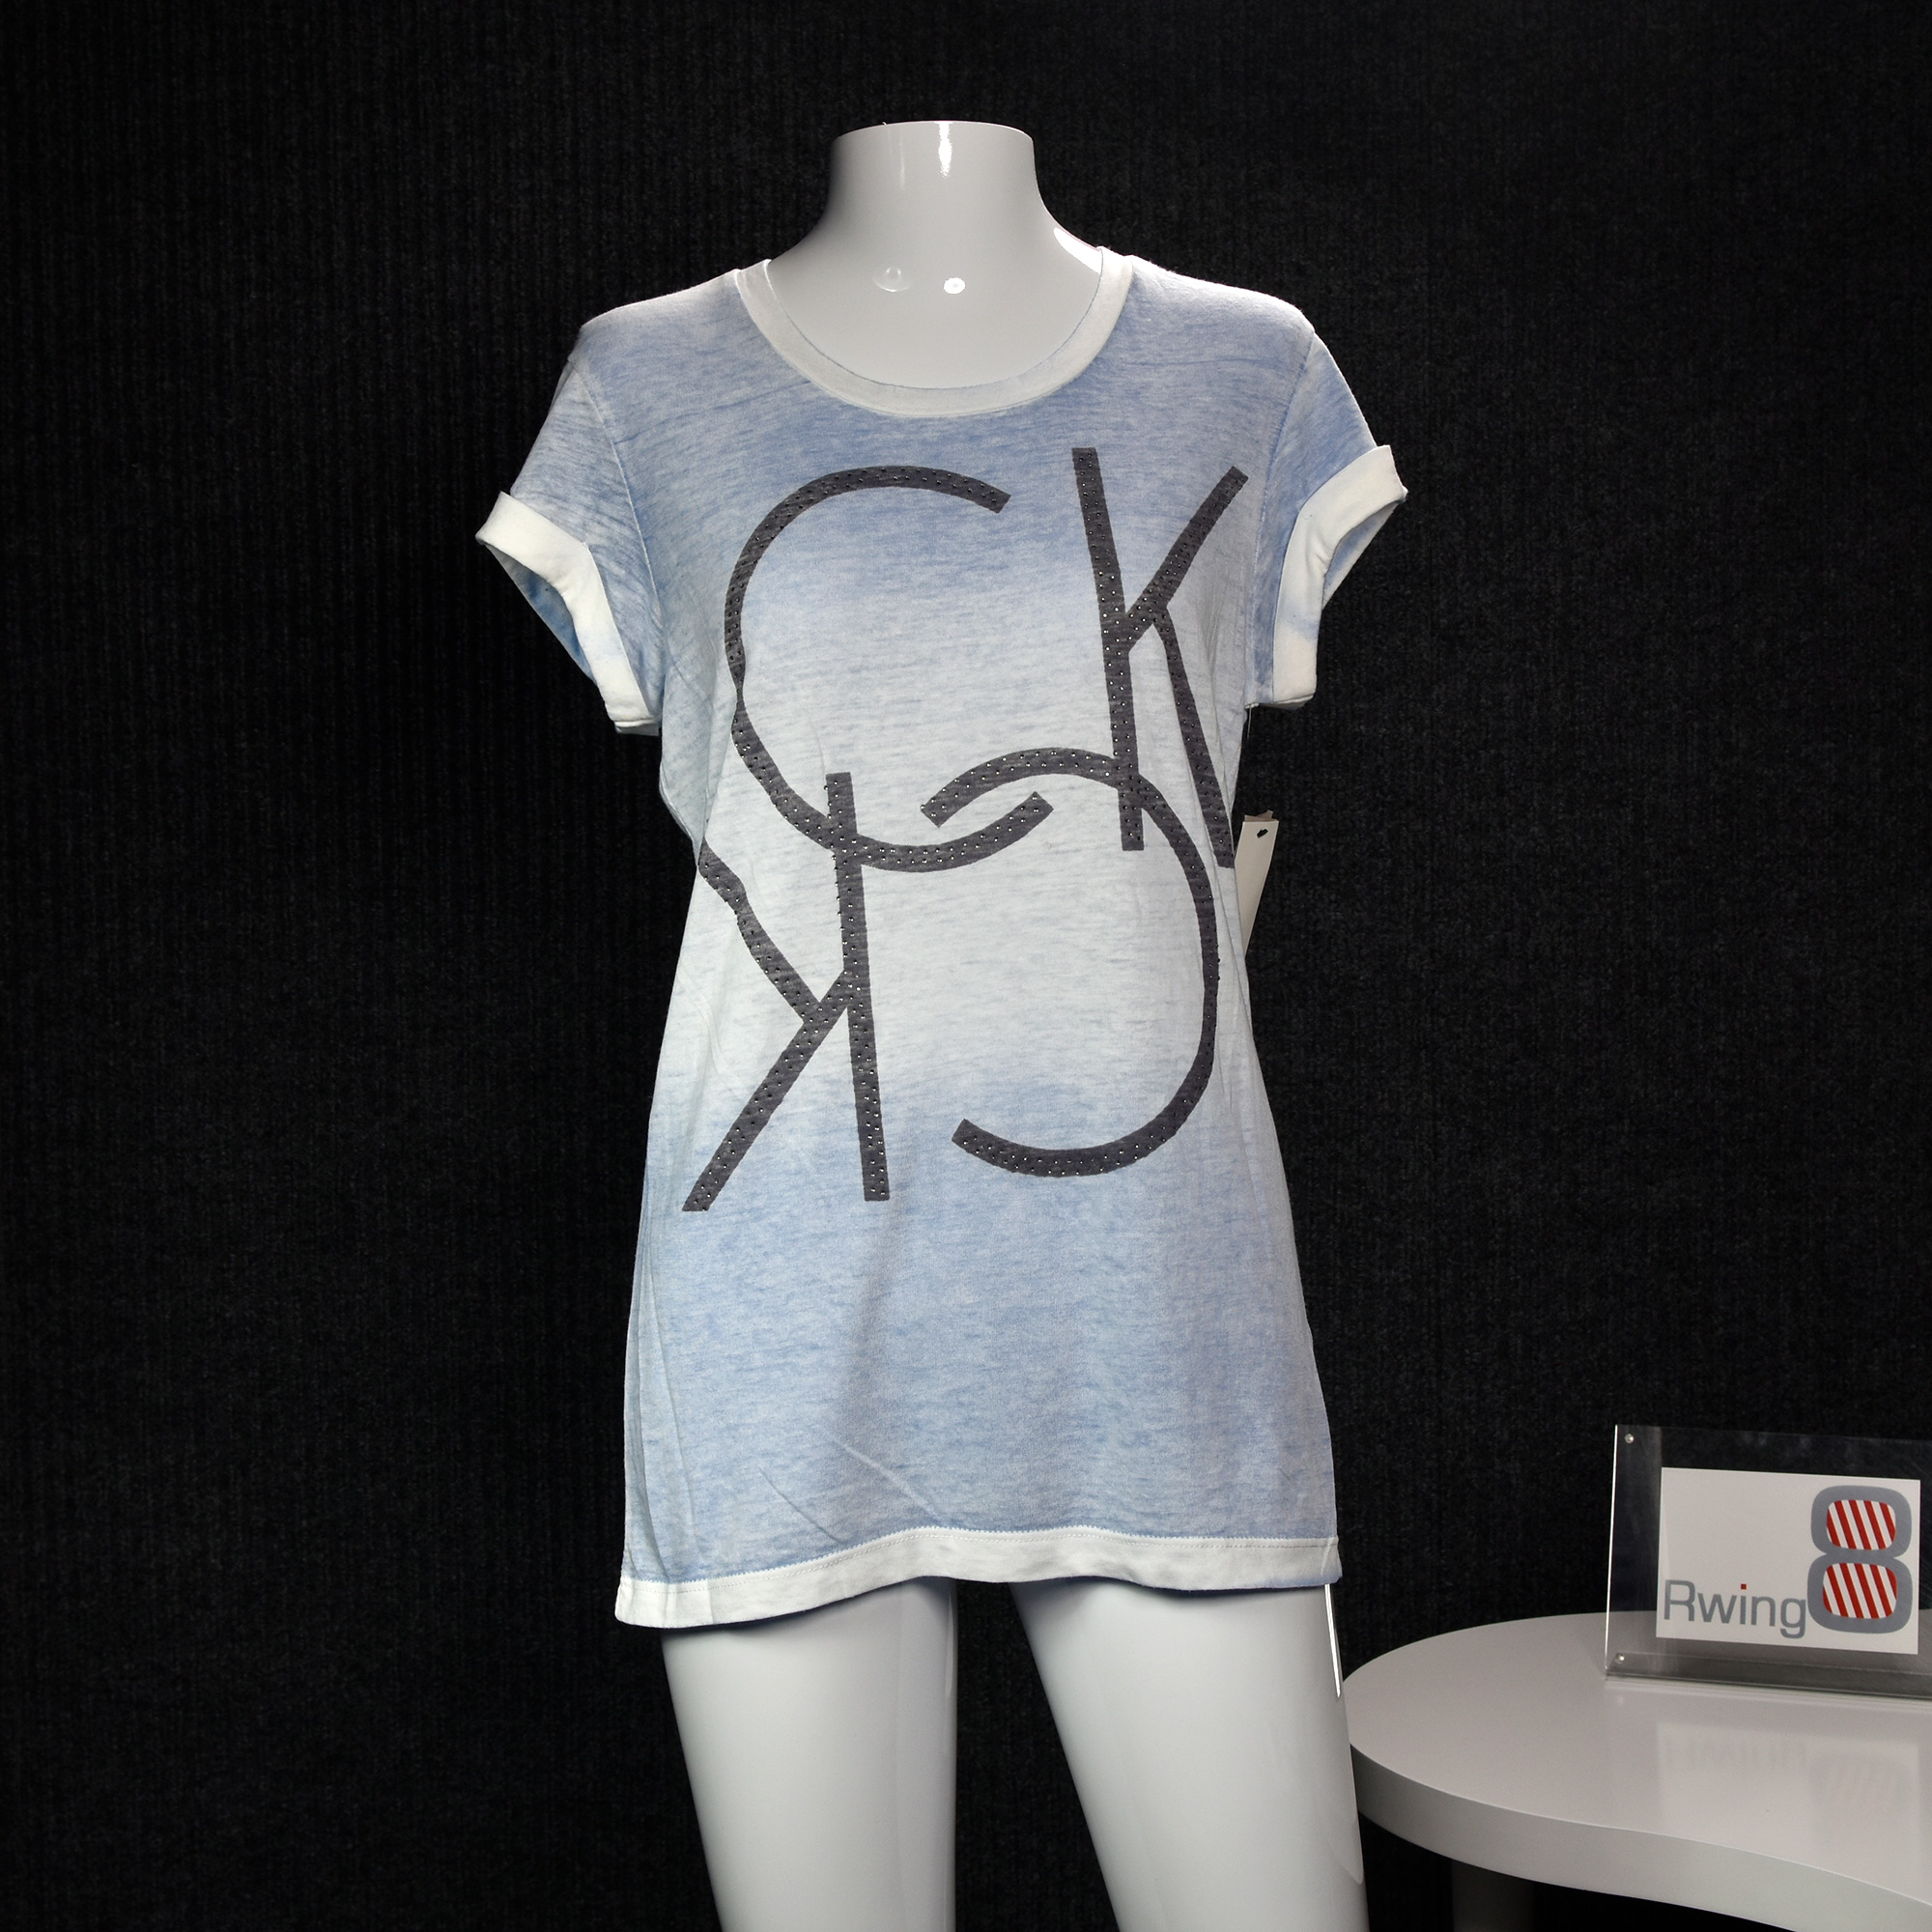 ⭐Calvin Klein Jeans CK 女装 镶钻装饰 渐变色 短袖T恤